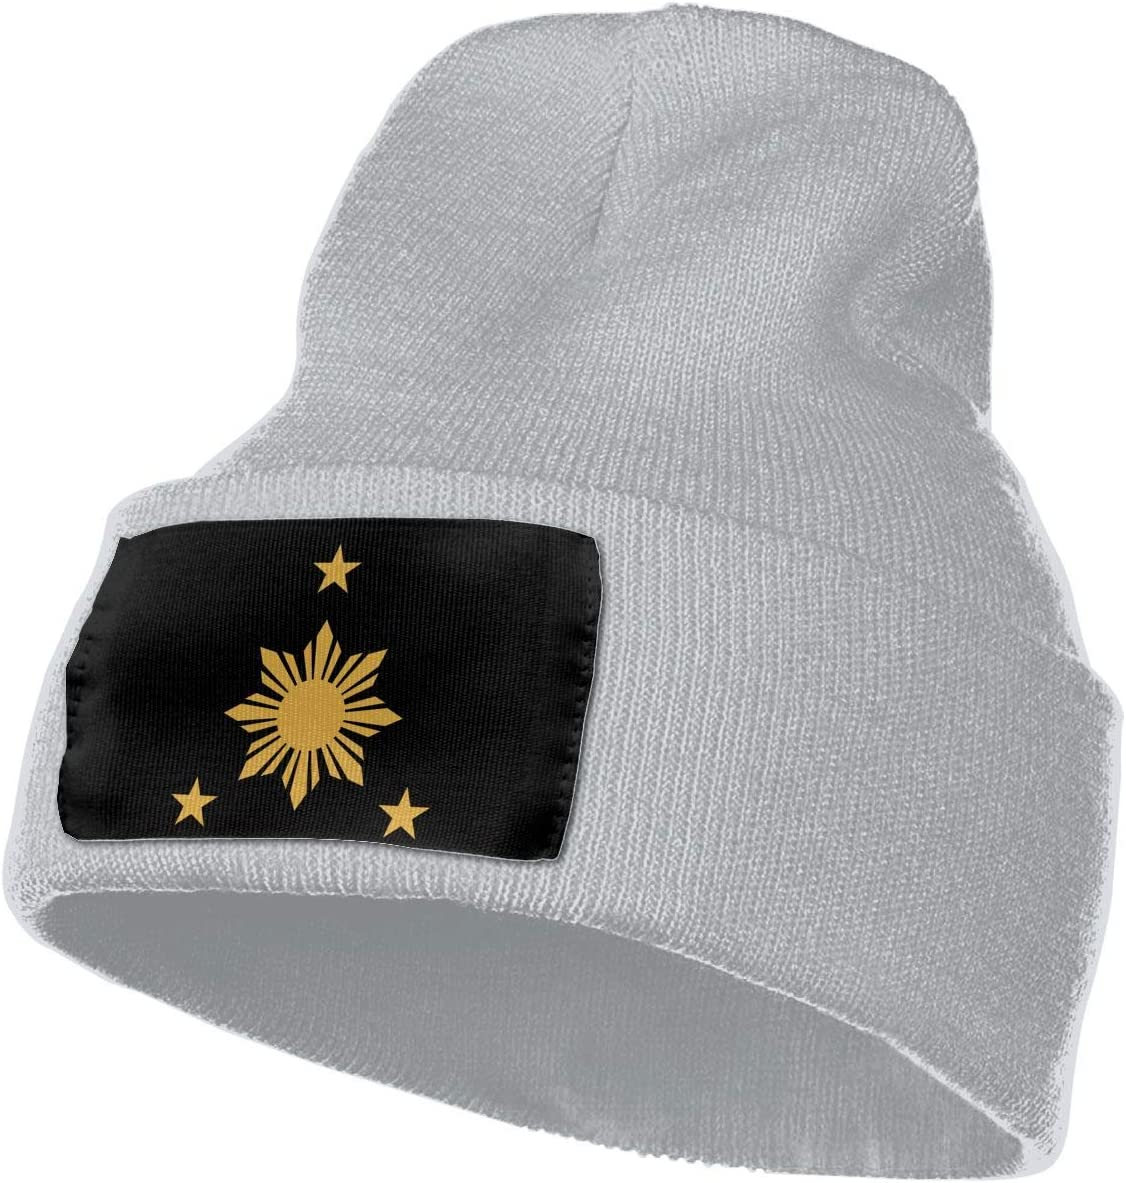 Filipino Stars and Sun Men/&Women Warm Winter Knit Plain Beanie Hat Skull Cap Acrylic Knit Cuff Hat